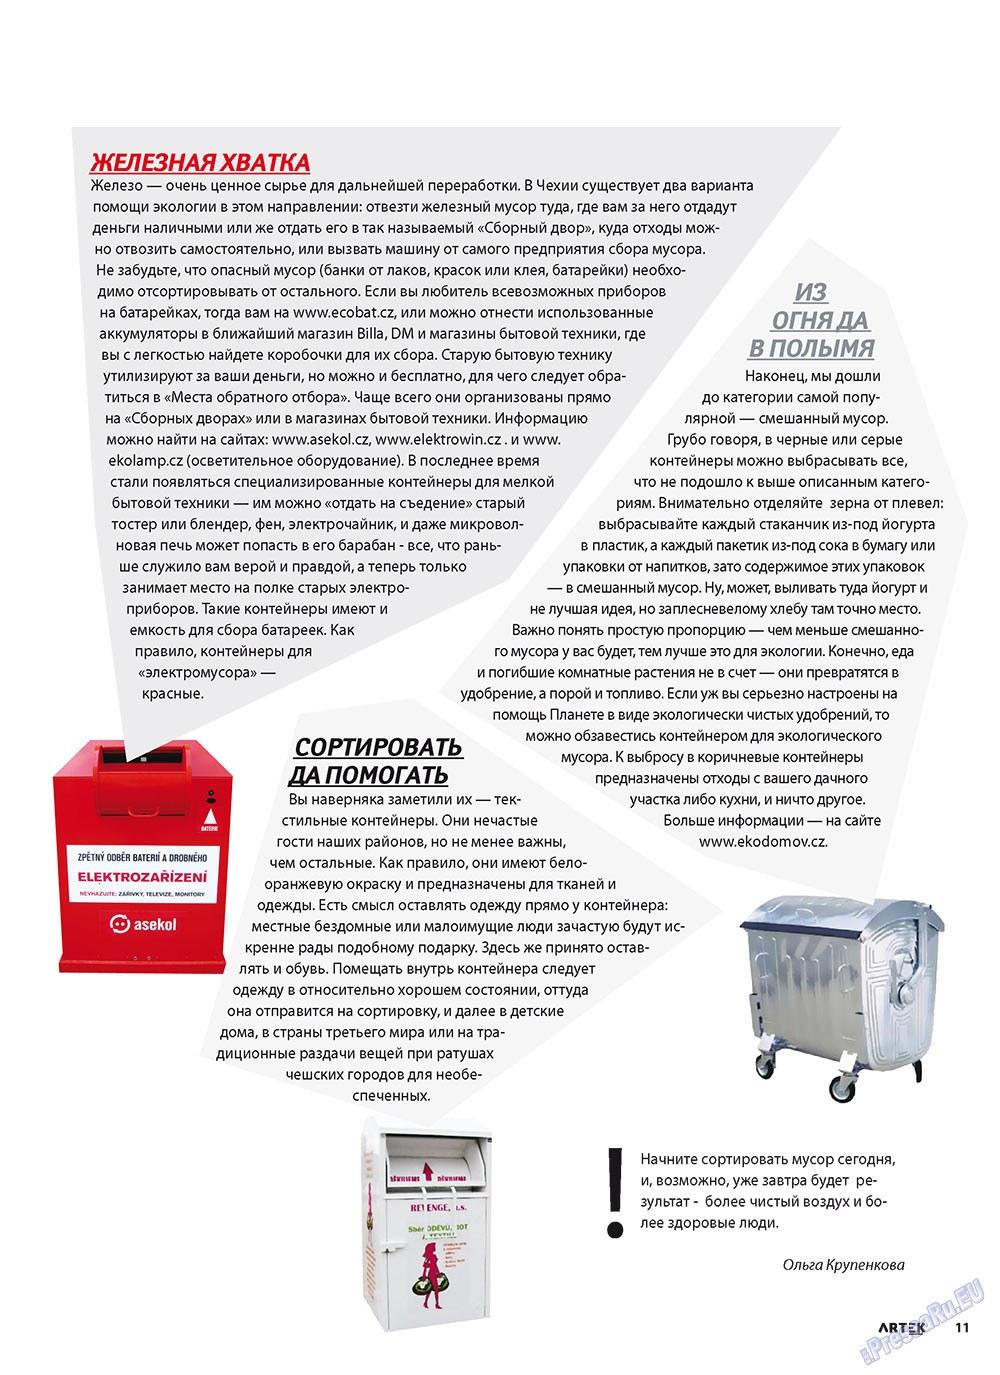 Артек (журнал). 2011 год, номер 2, стр. 13